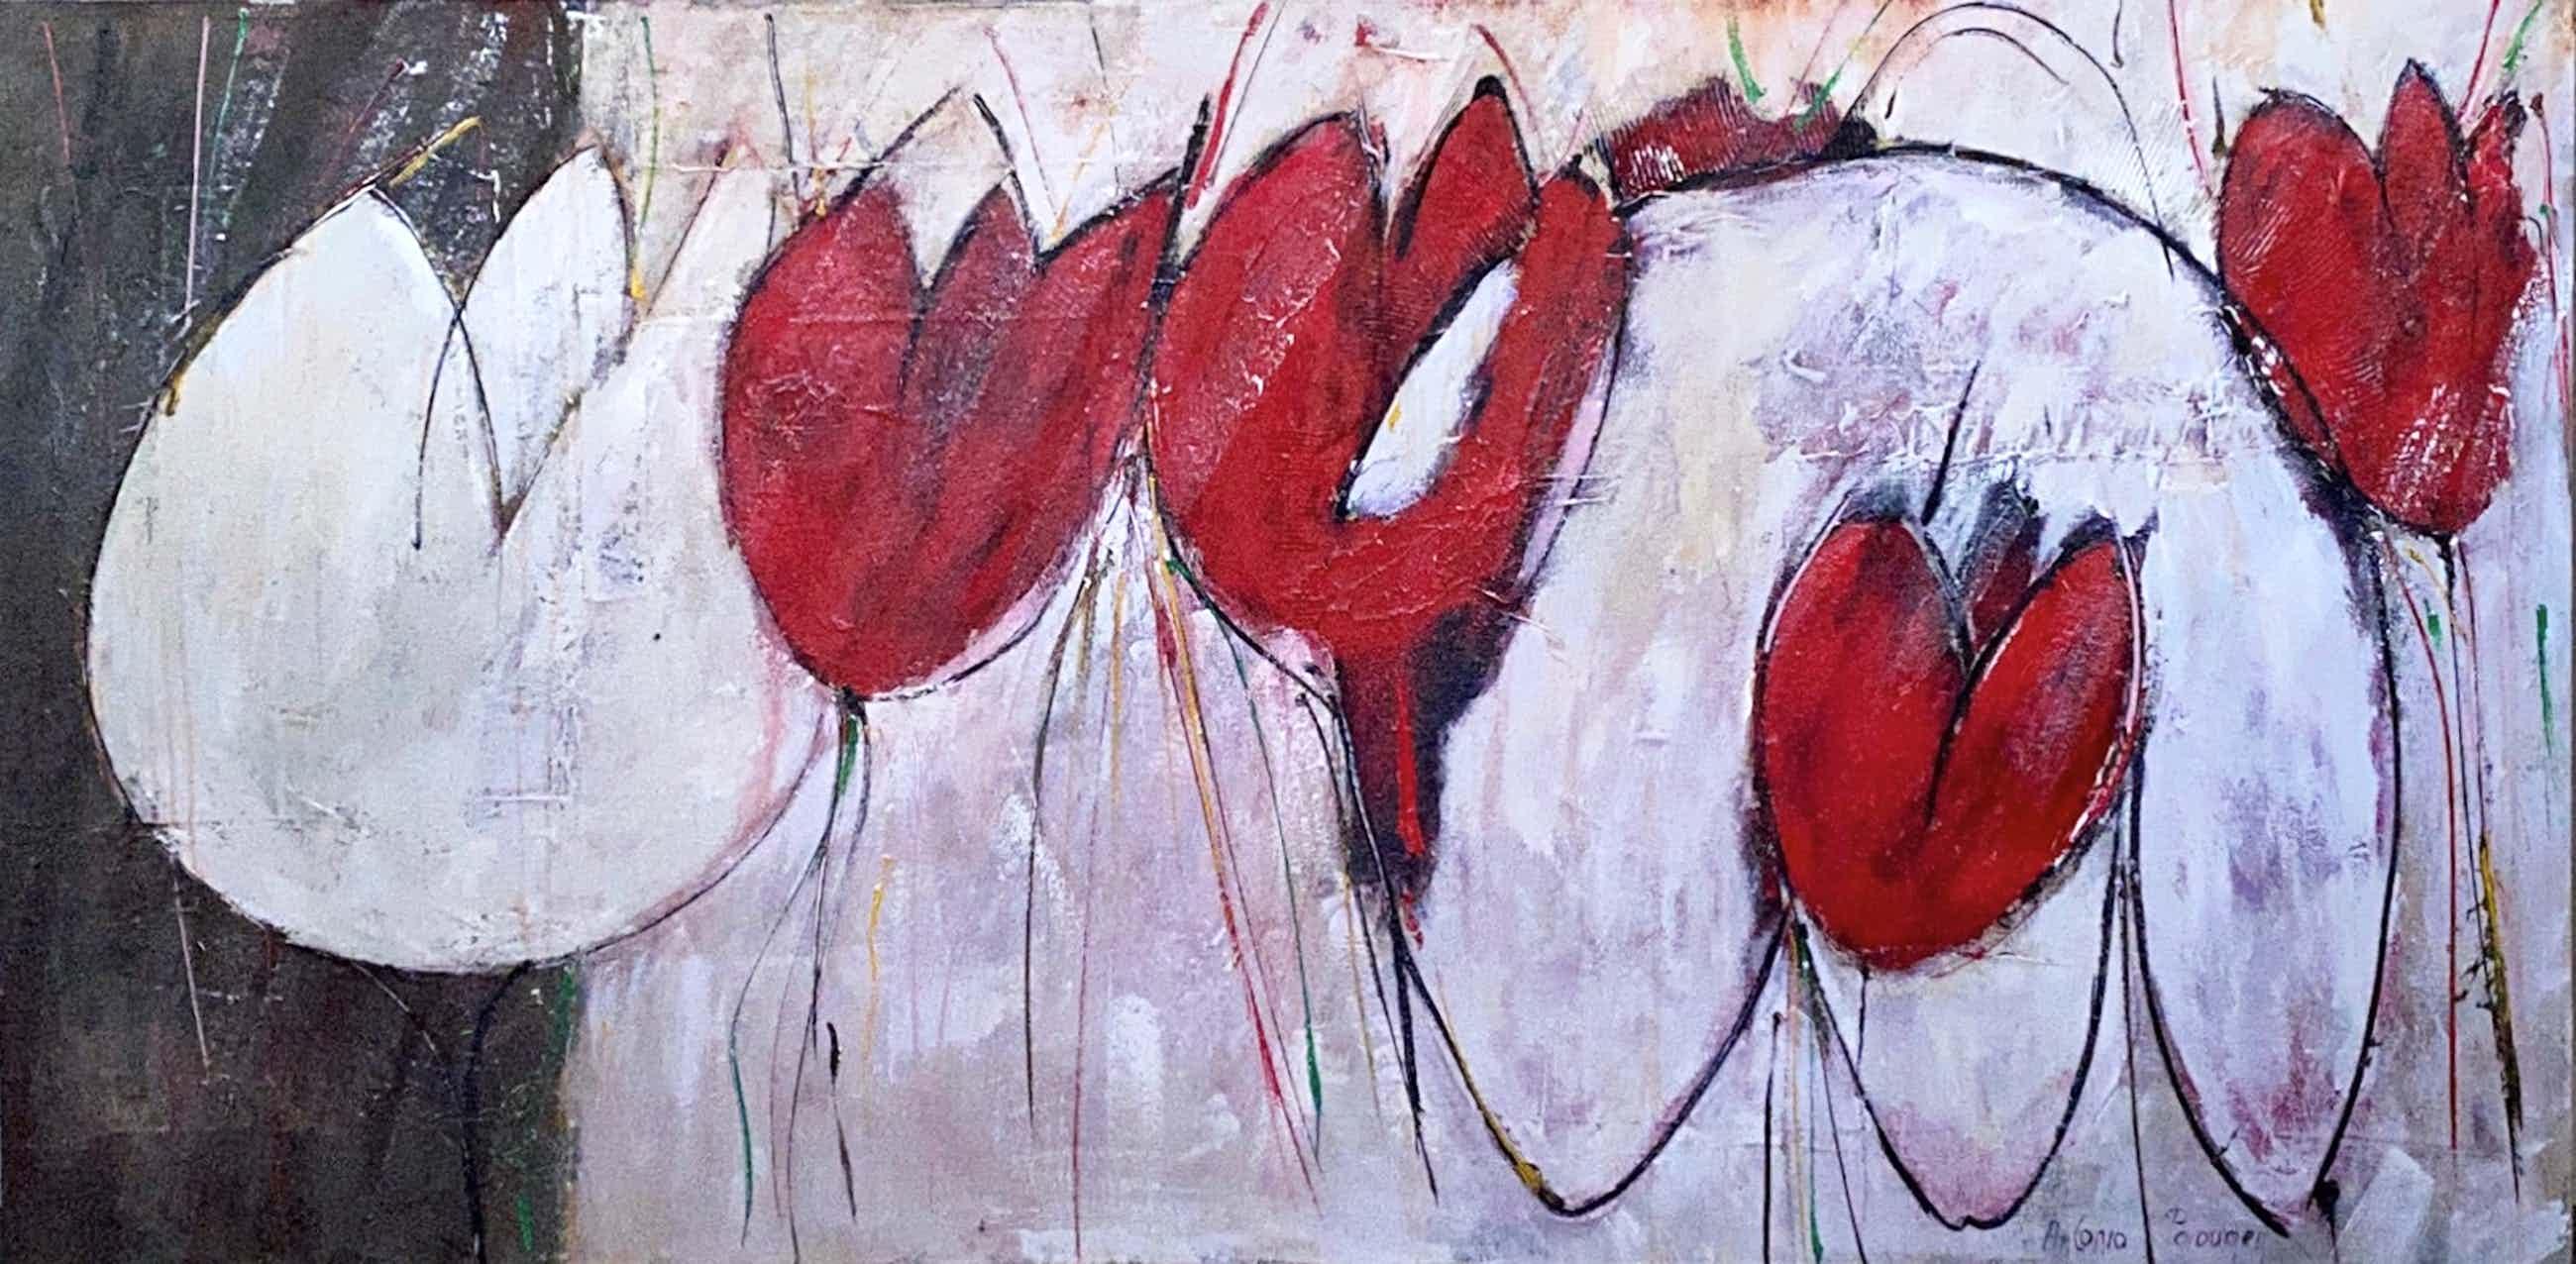 Antonio Poioumen - Red and White Tulips kopen? Bied vanaf 500!